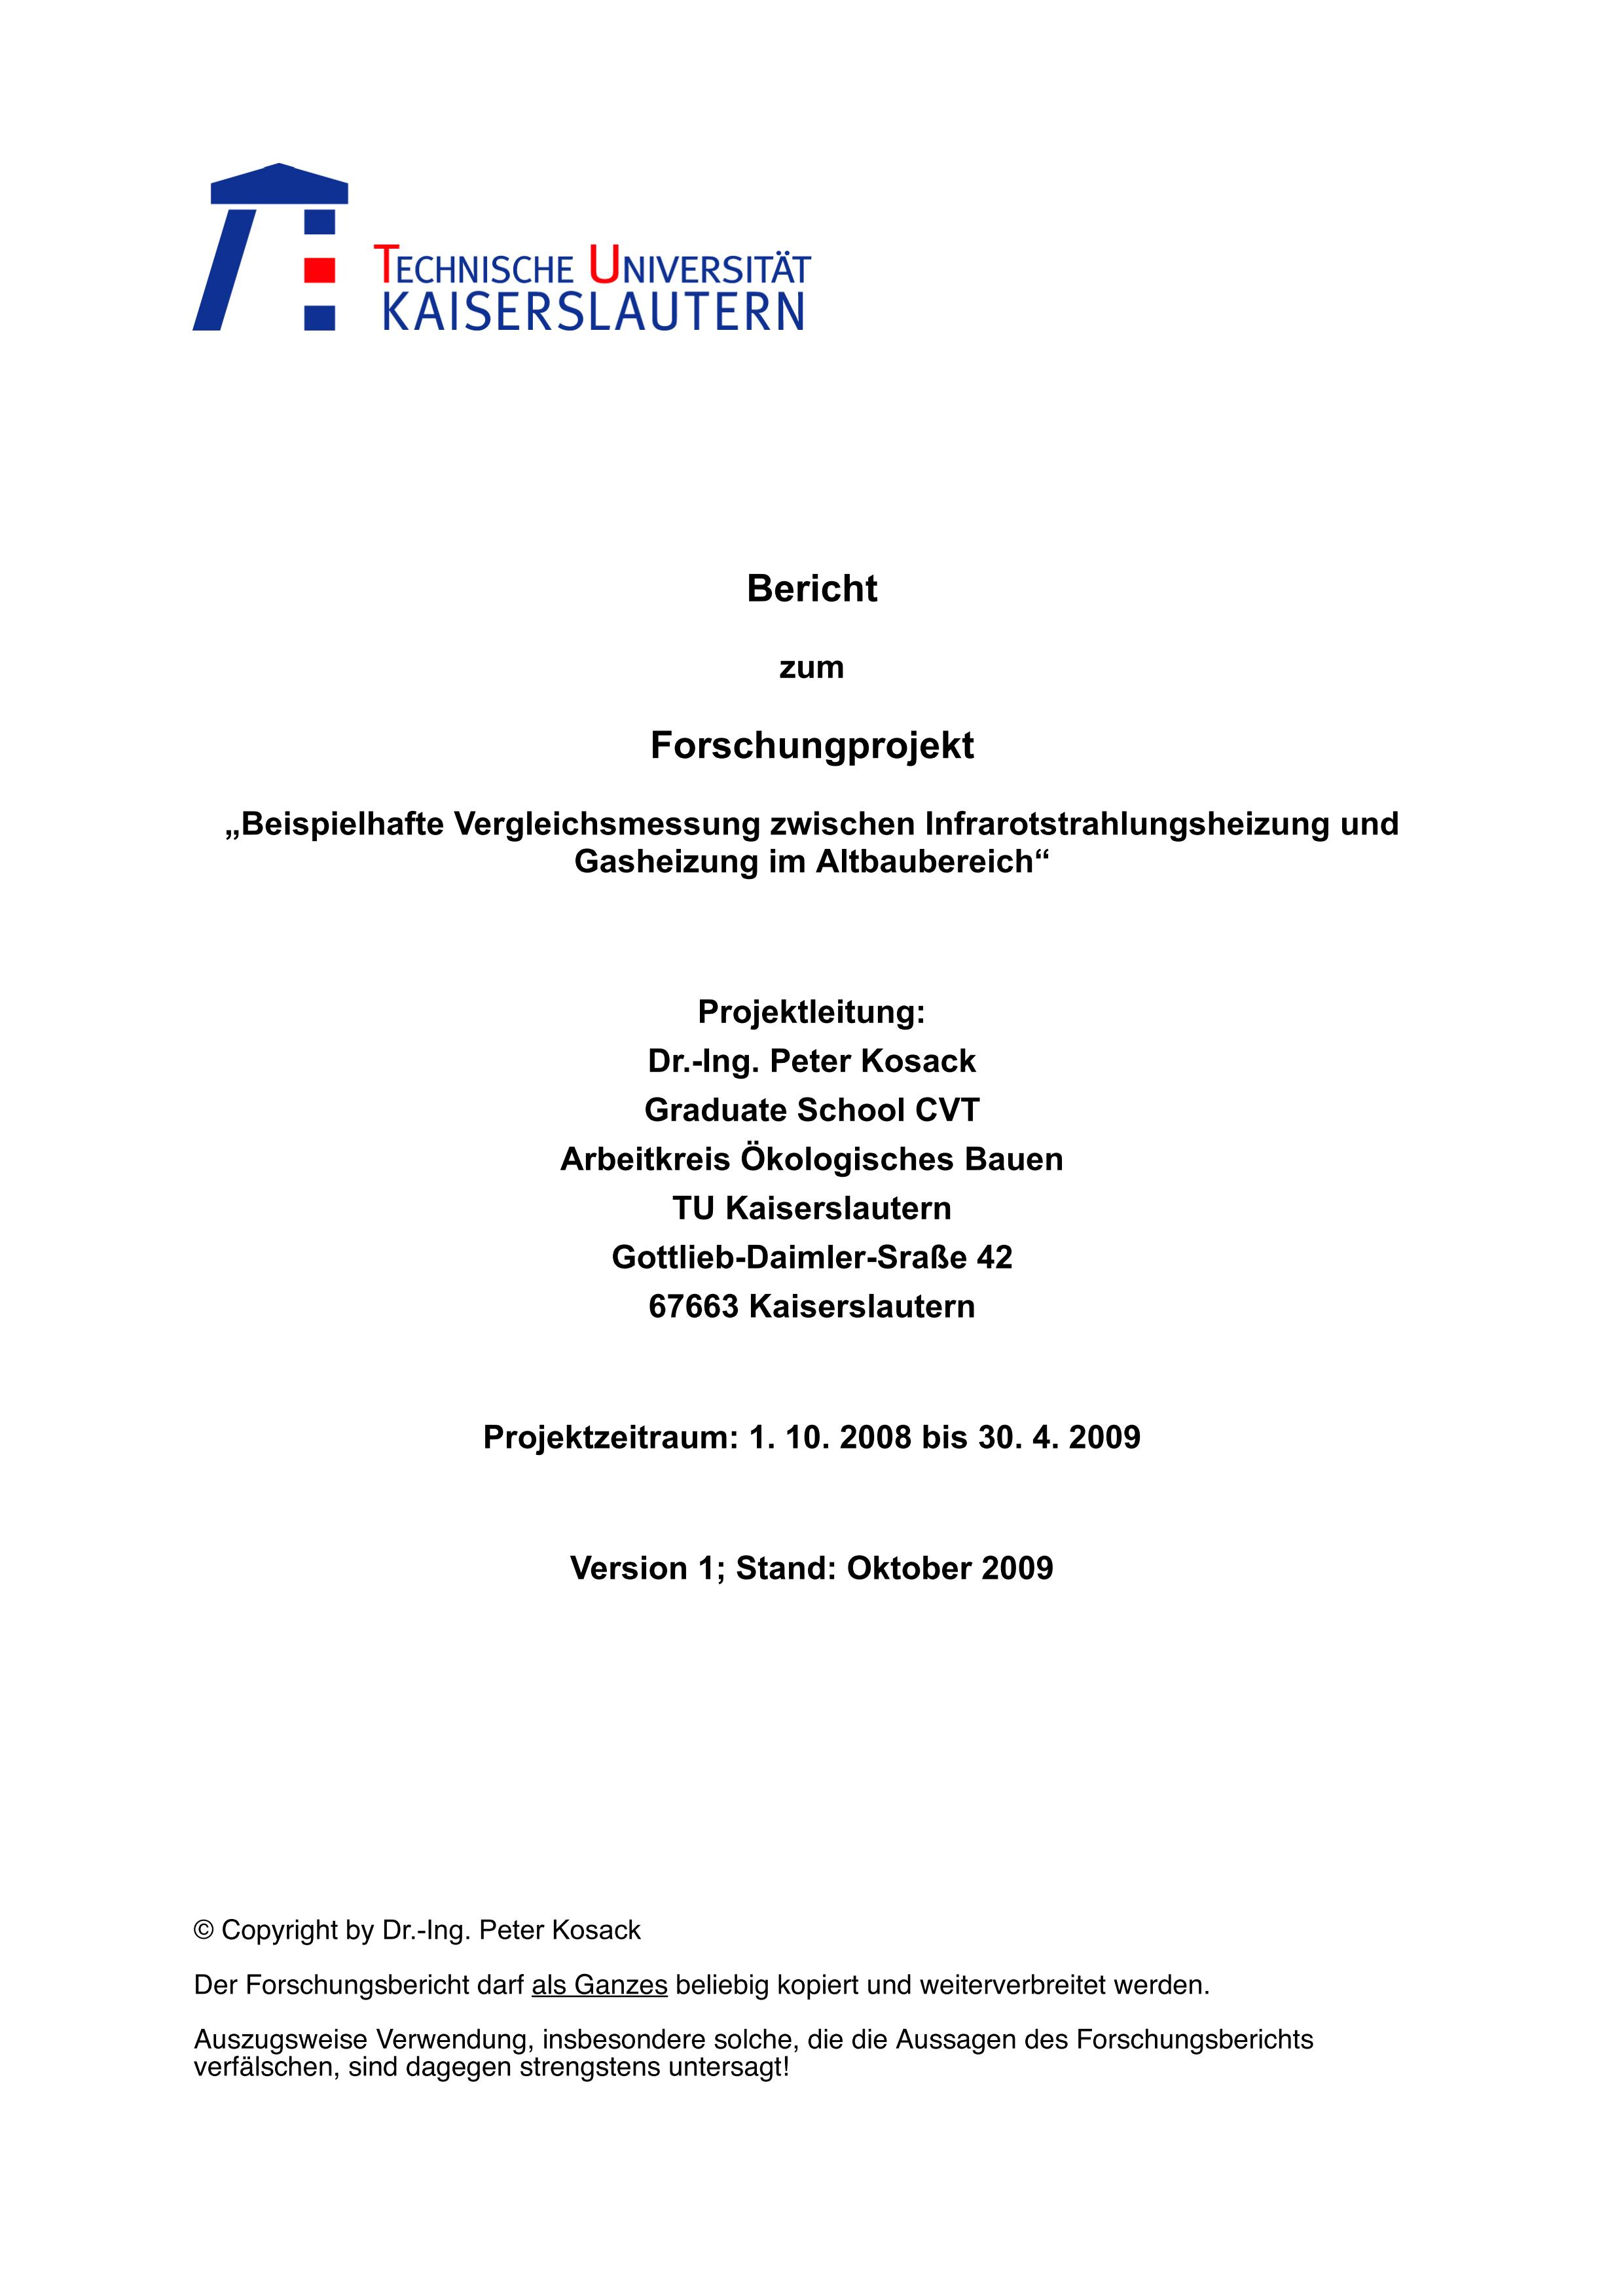 Infrarotheizung_Forschungsbericht_Knebel-Infrarotheizungen_01